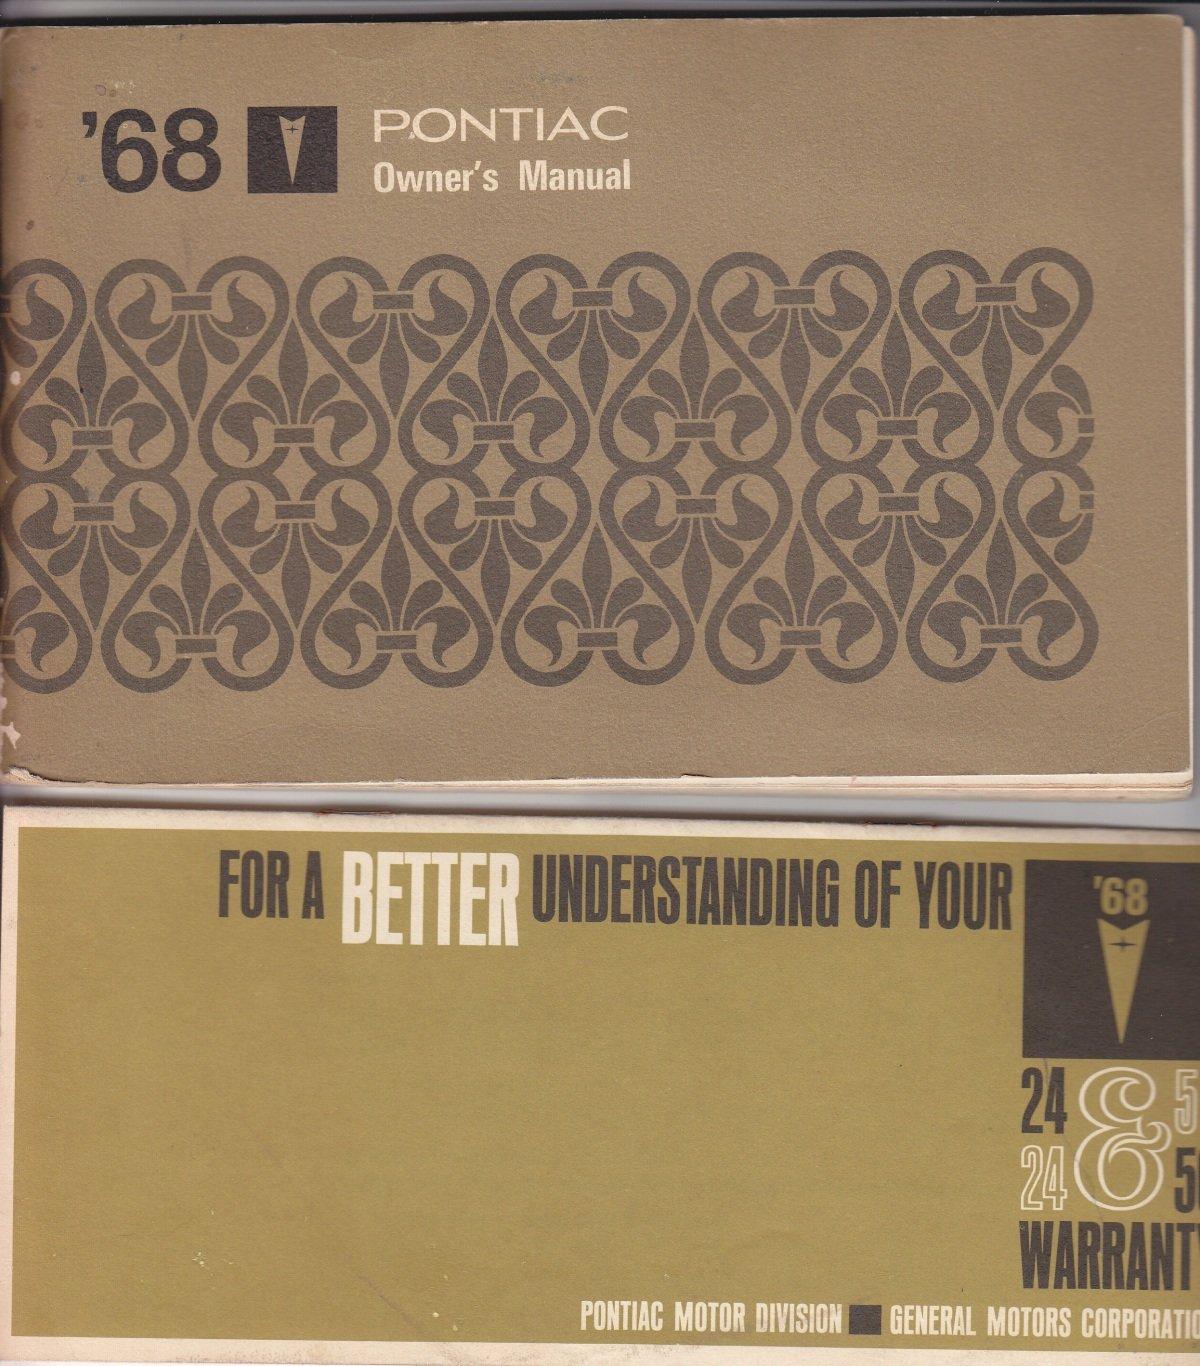 1968 Pontiac Owners Manual